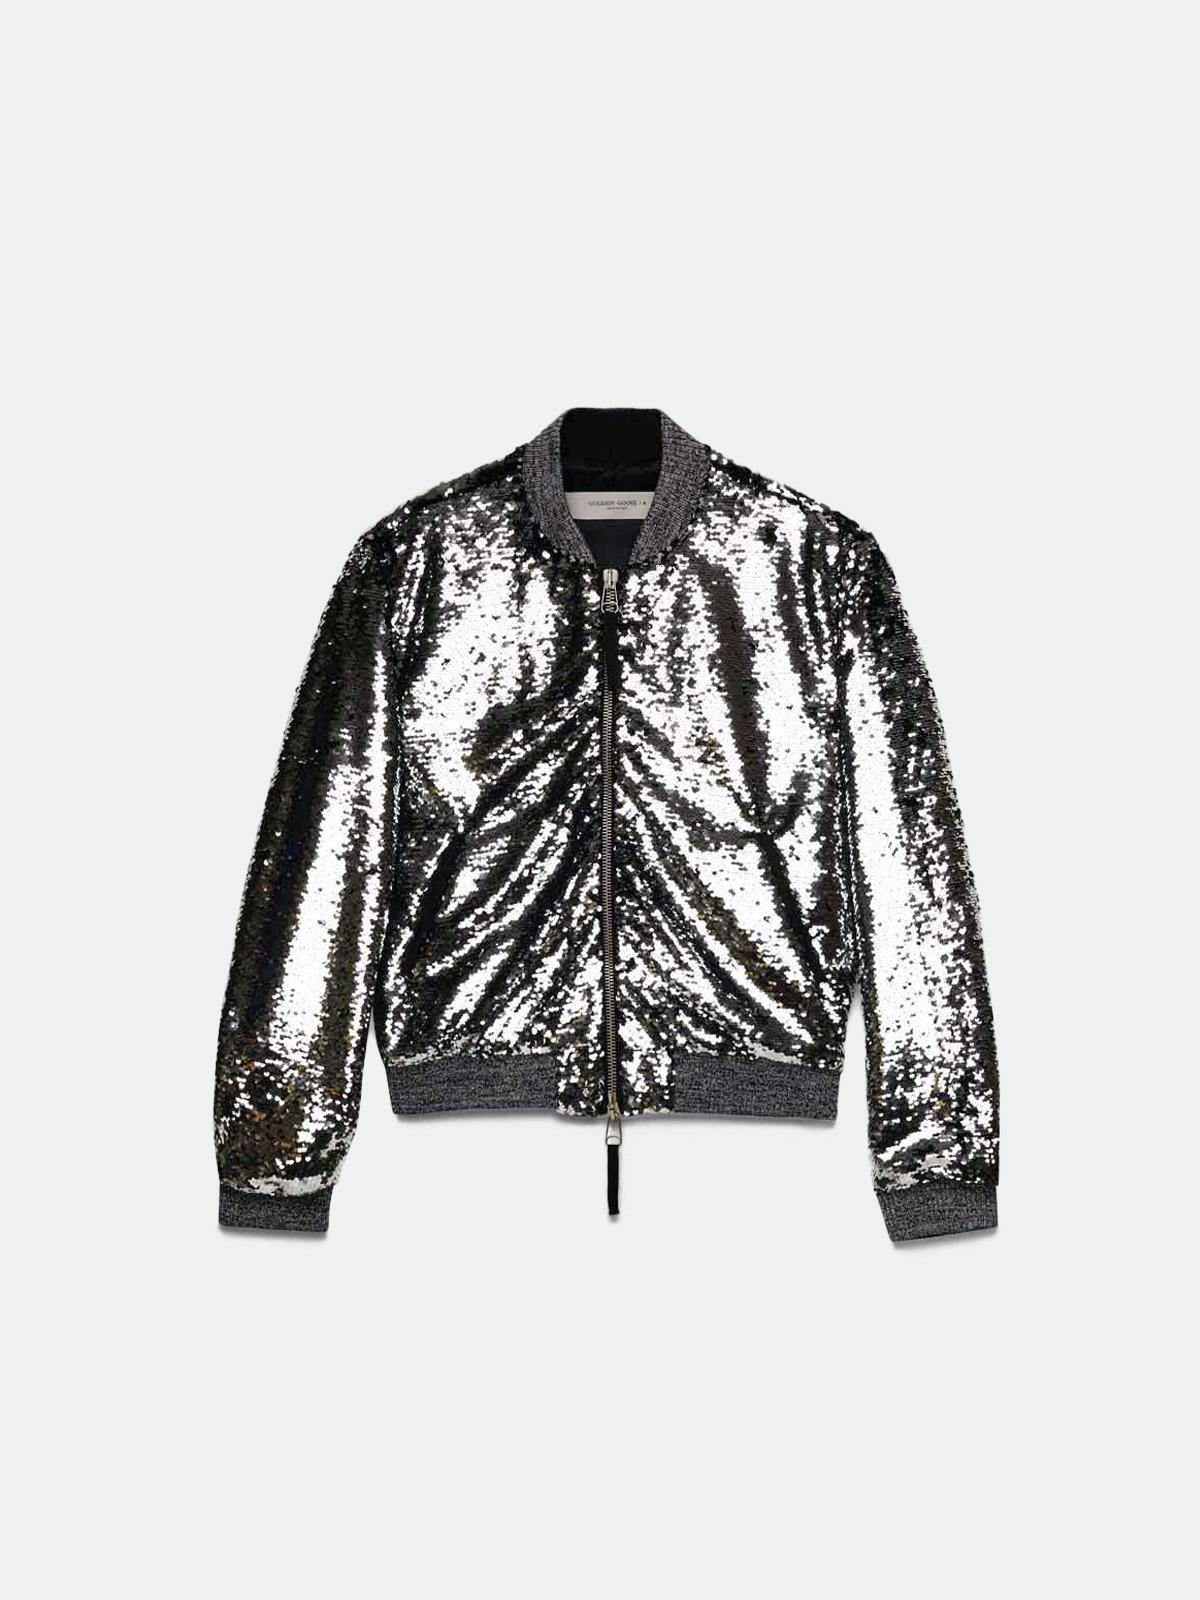 Golden Goose - Scarlett bomber jacket with reversible sequins in